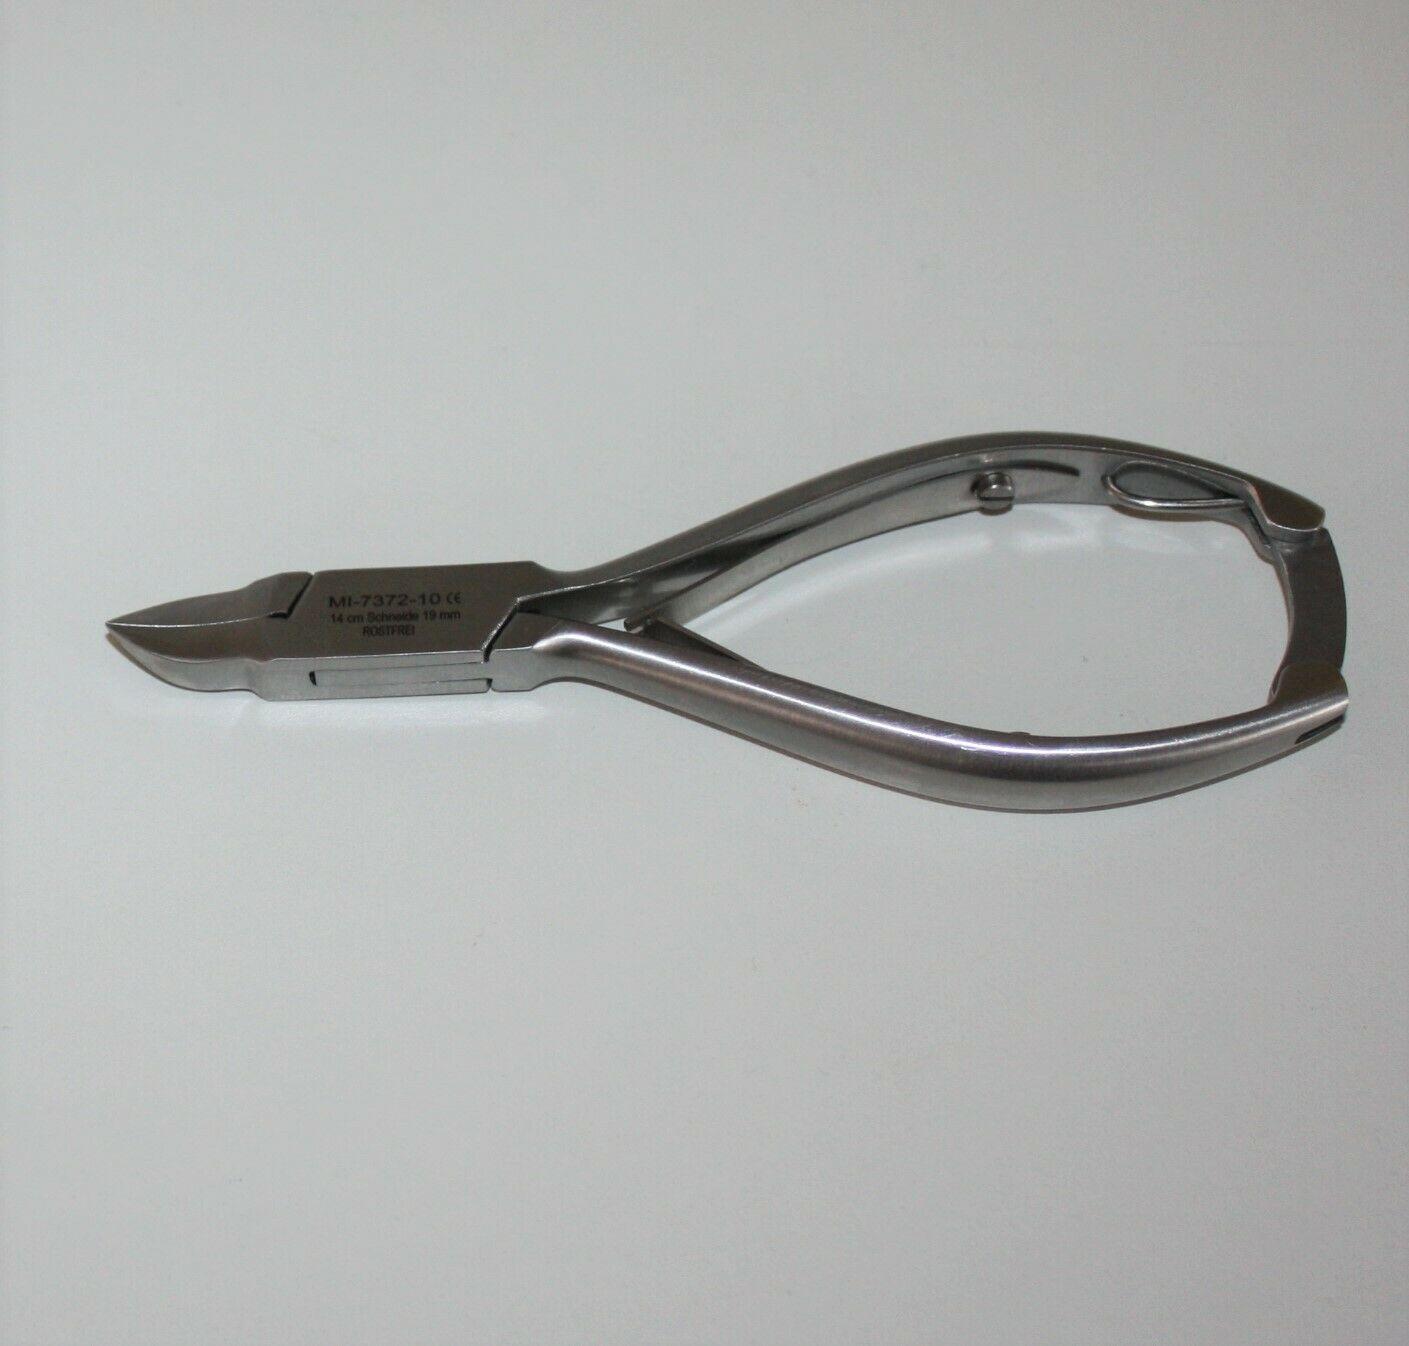 Nagelzange - gebogene, schlanke Schneide - slim - 14 cm / 20 mm